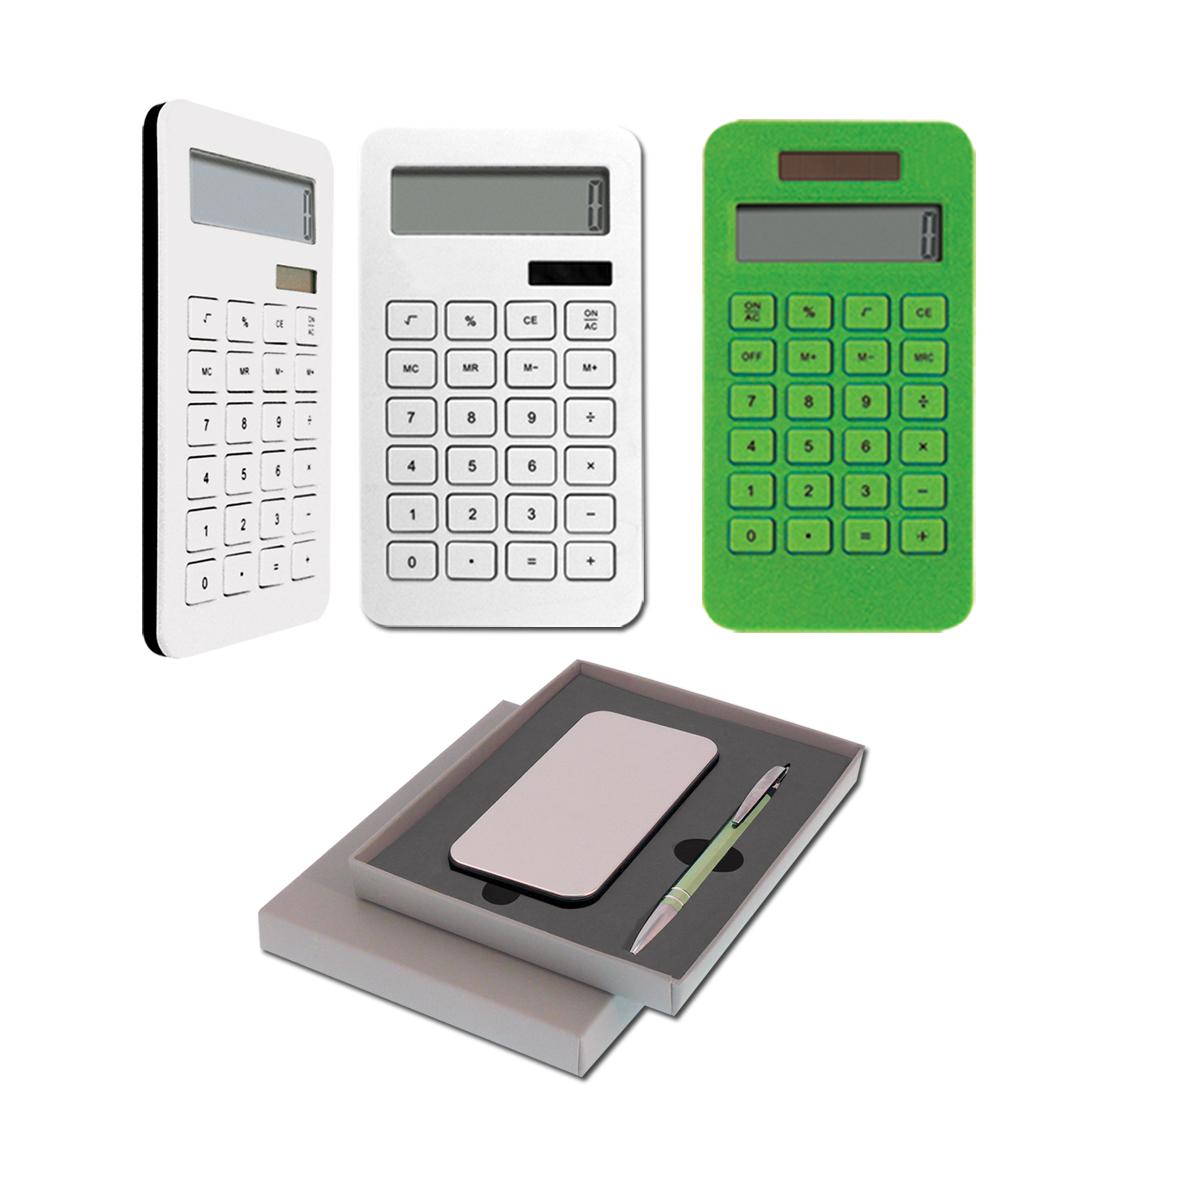 Highlighter & Calculators